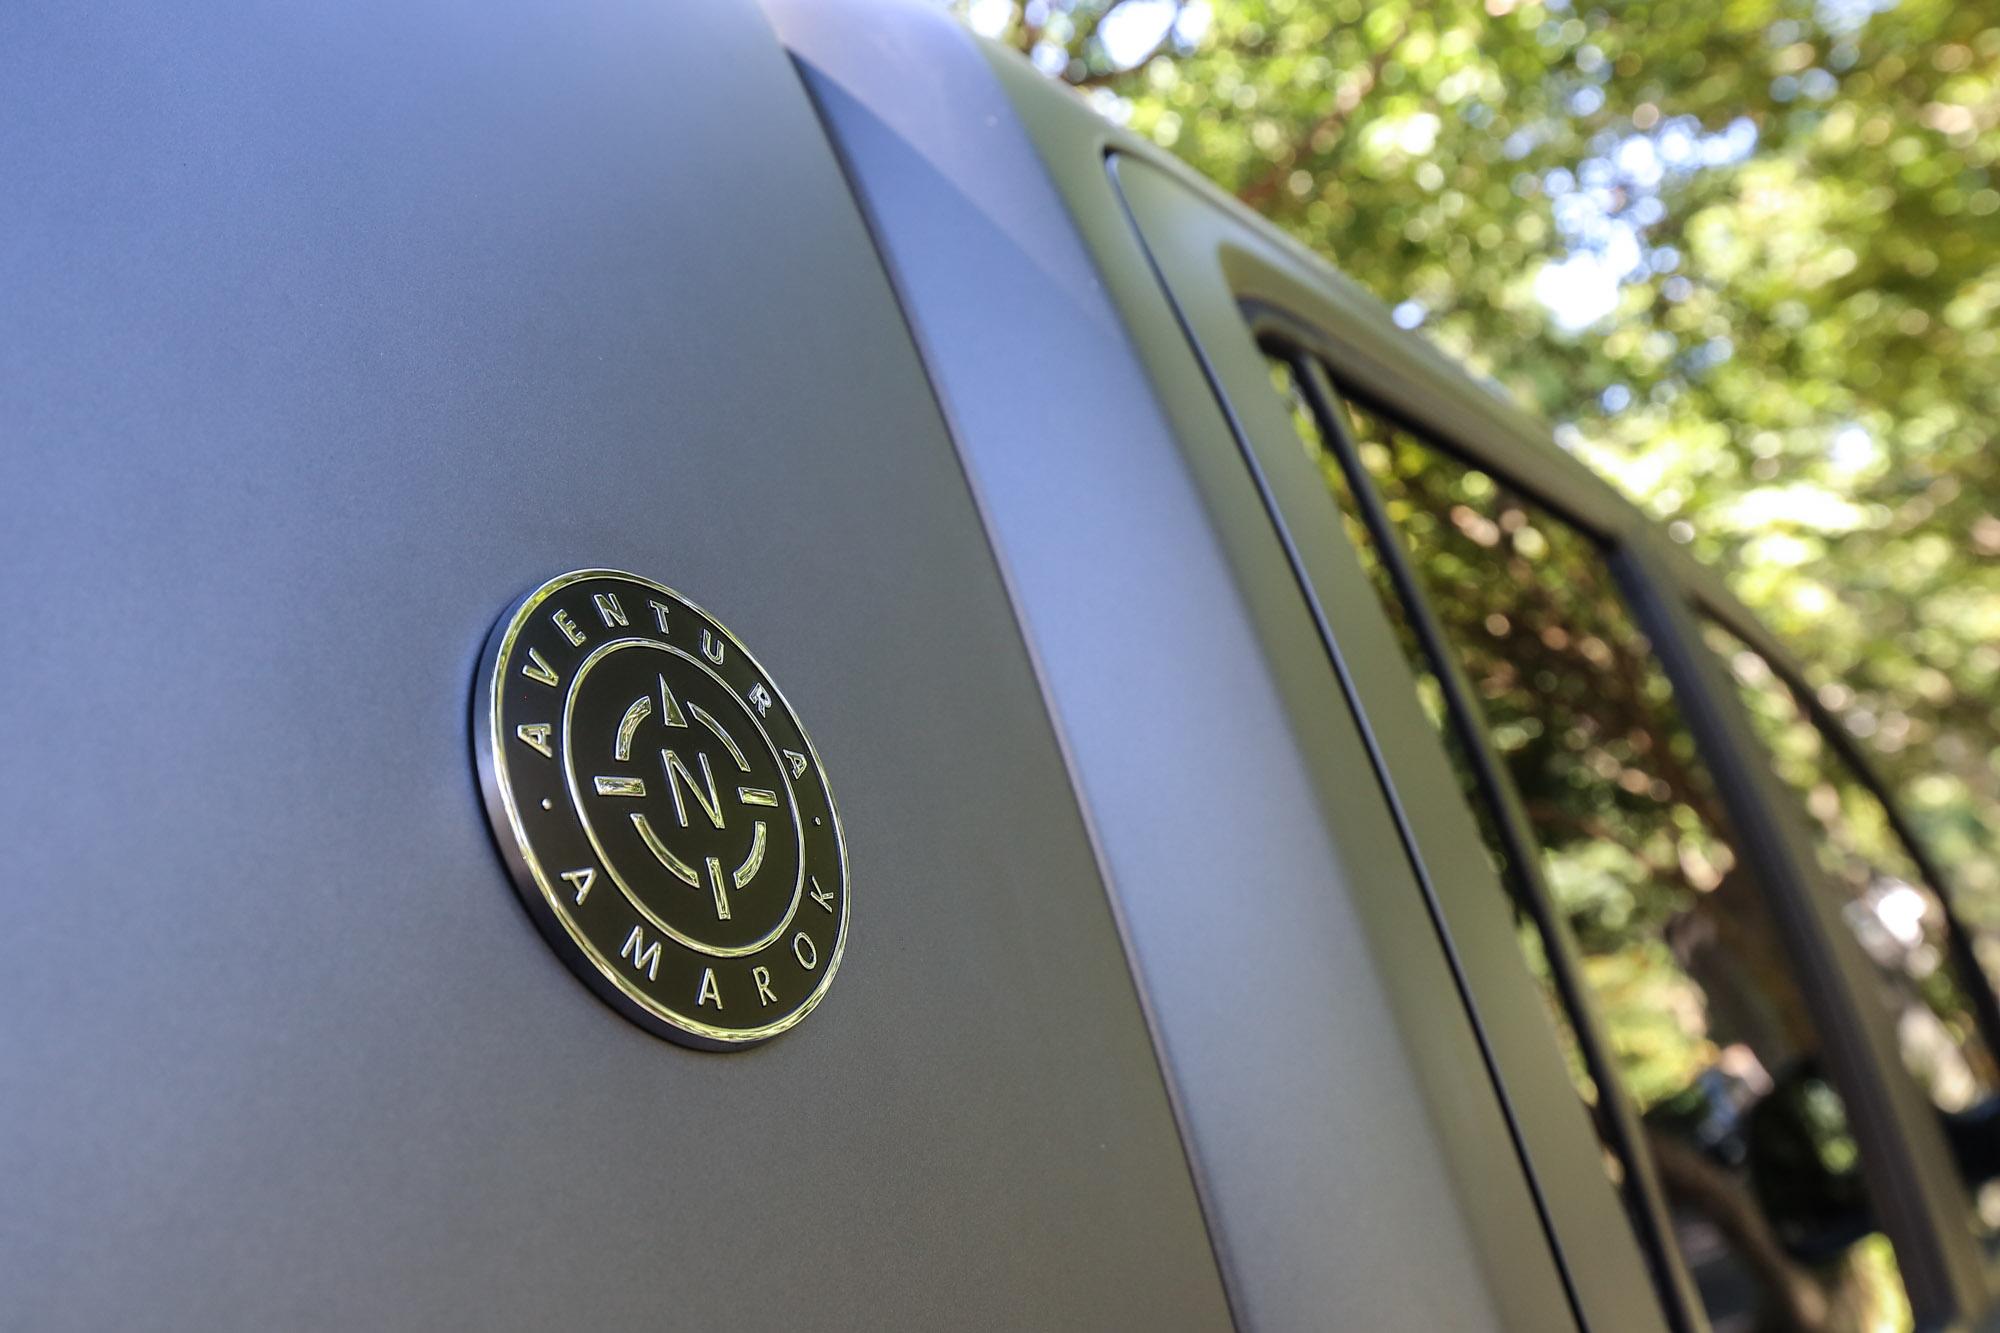 Amarok Aventura 專屬的飾徽設計於車身同色貨斗防護架上。